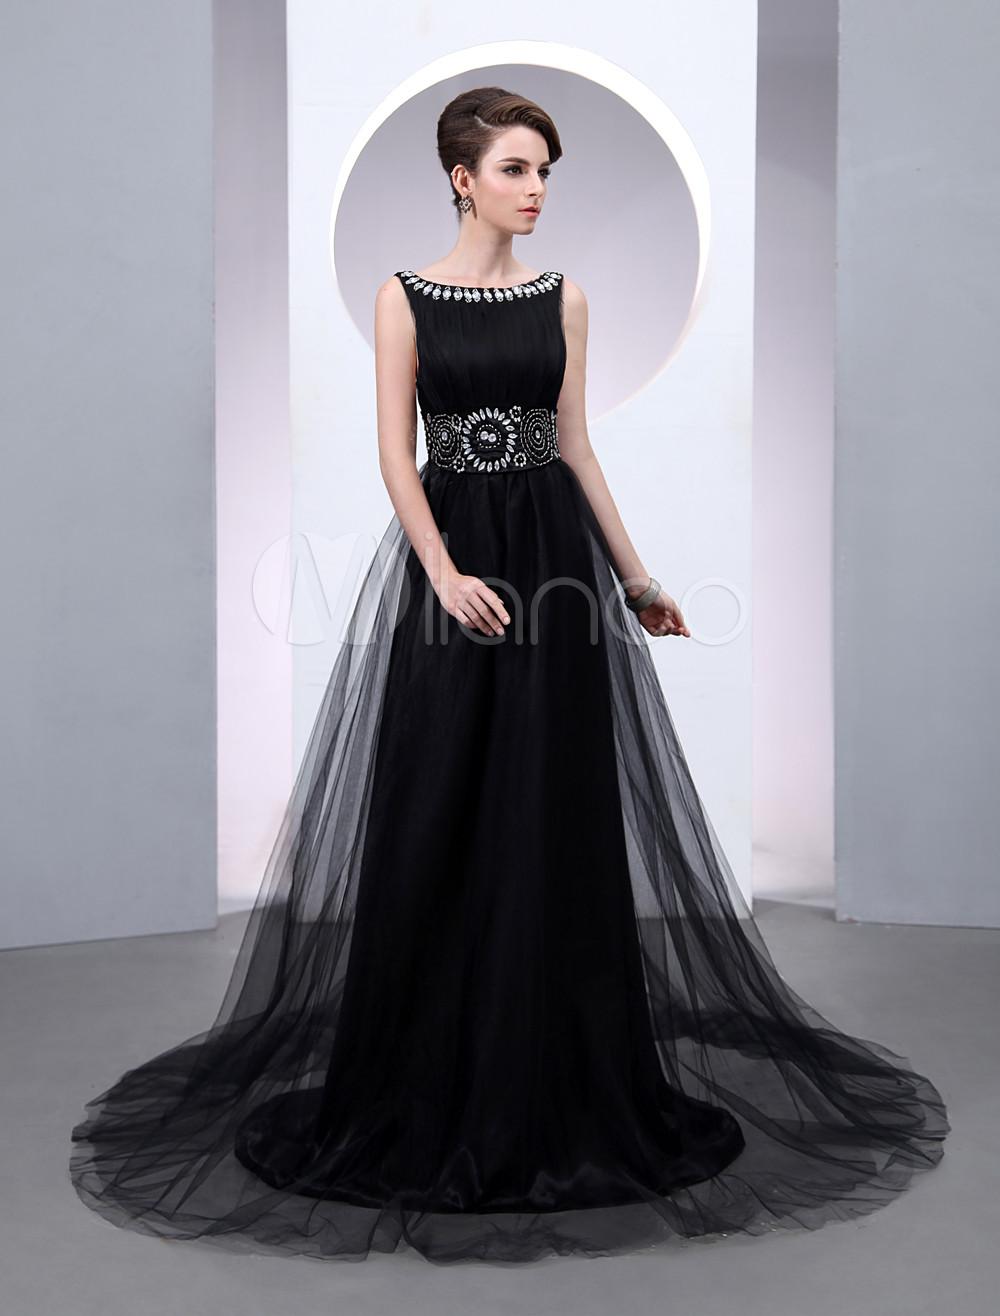 Black Wedding Dress Satin Tulle Scoop Neck Court Train Rhinestone Beaded Low Back Evening Dress